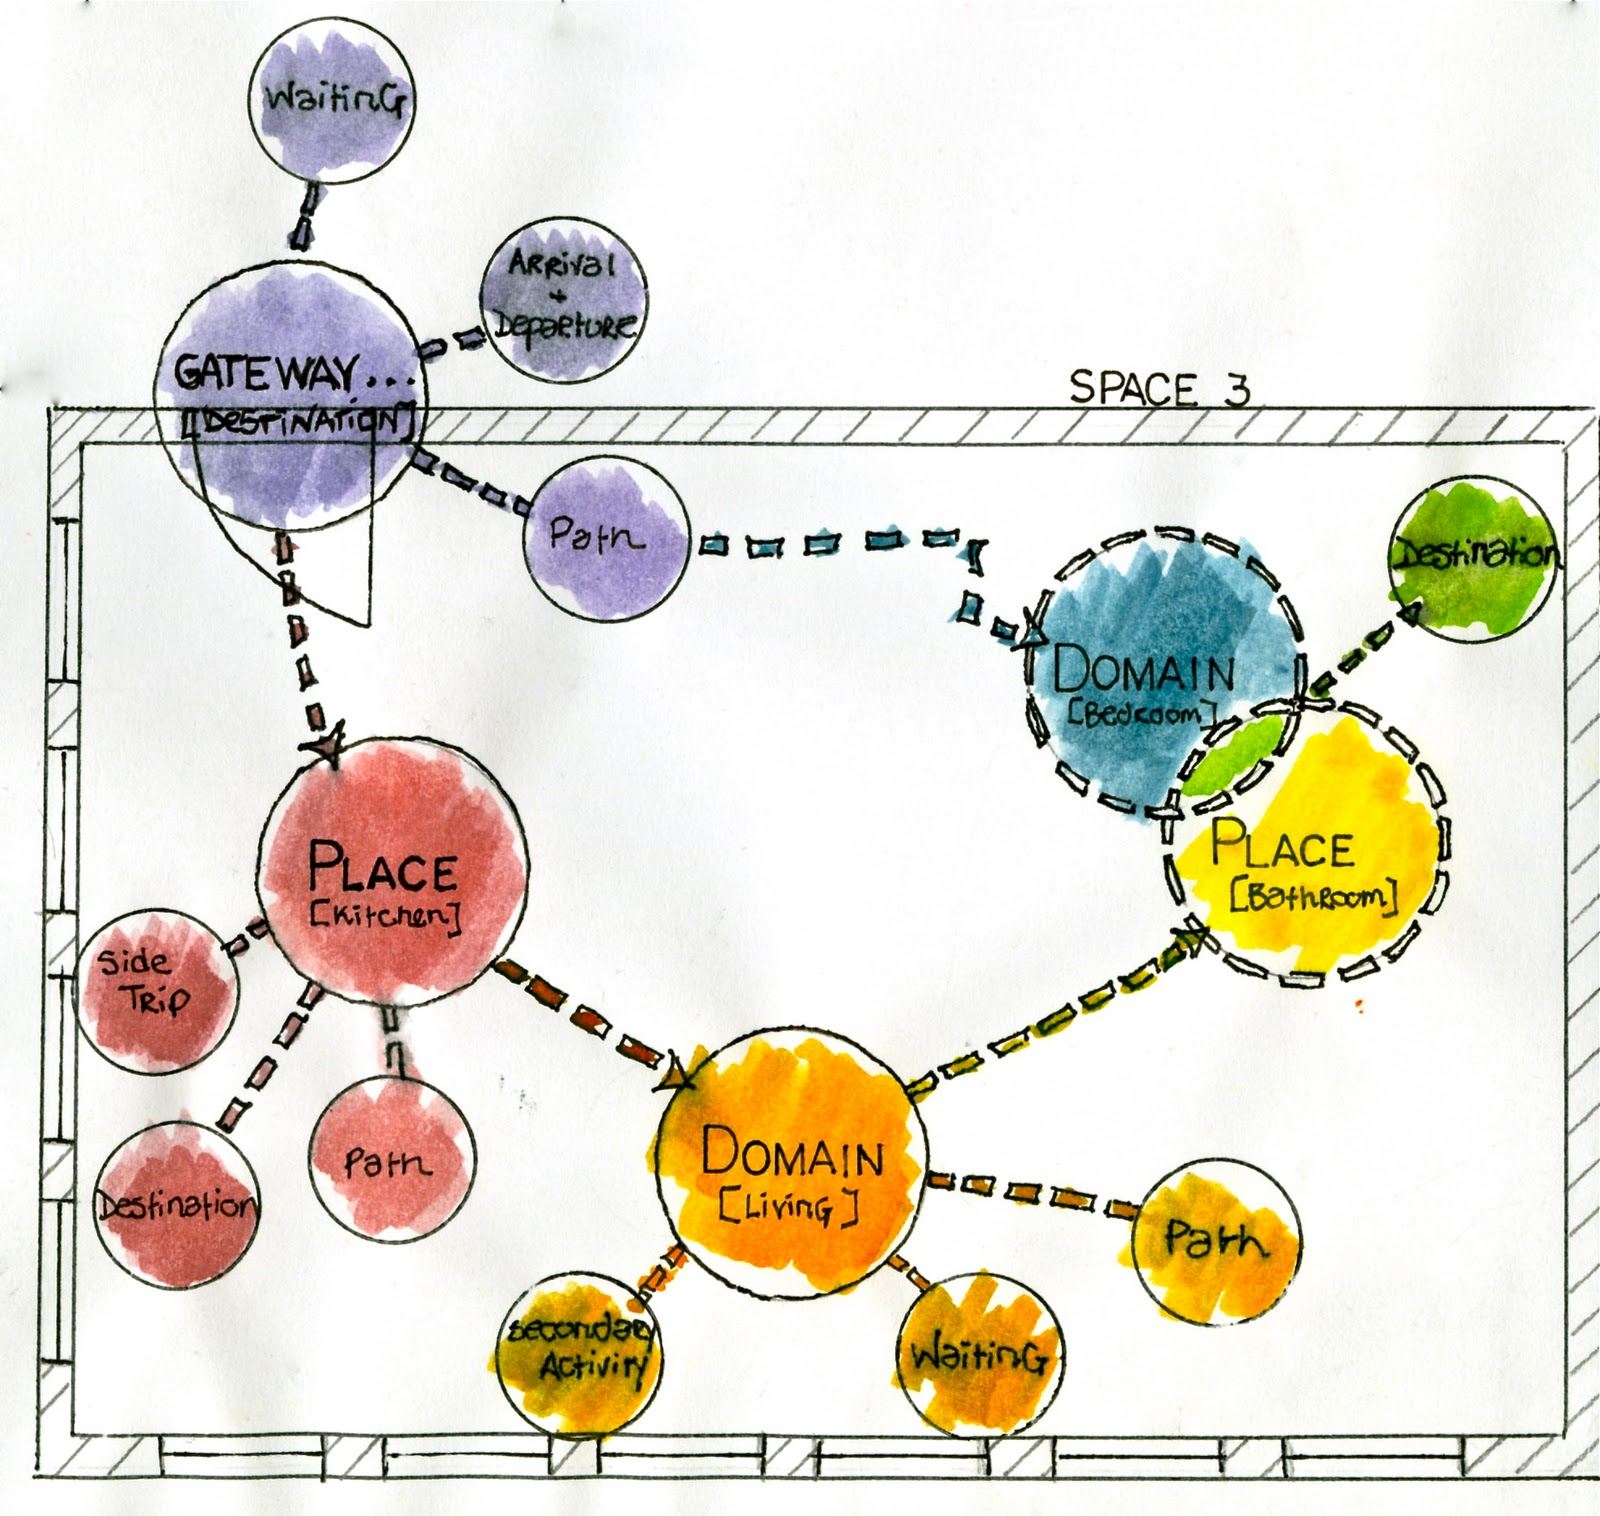 master plan architecture bubble diagram mitsubishi transmission a world of interior design residential